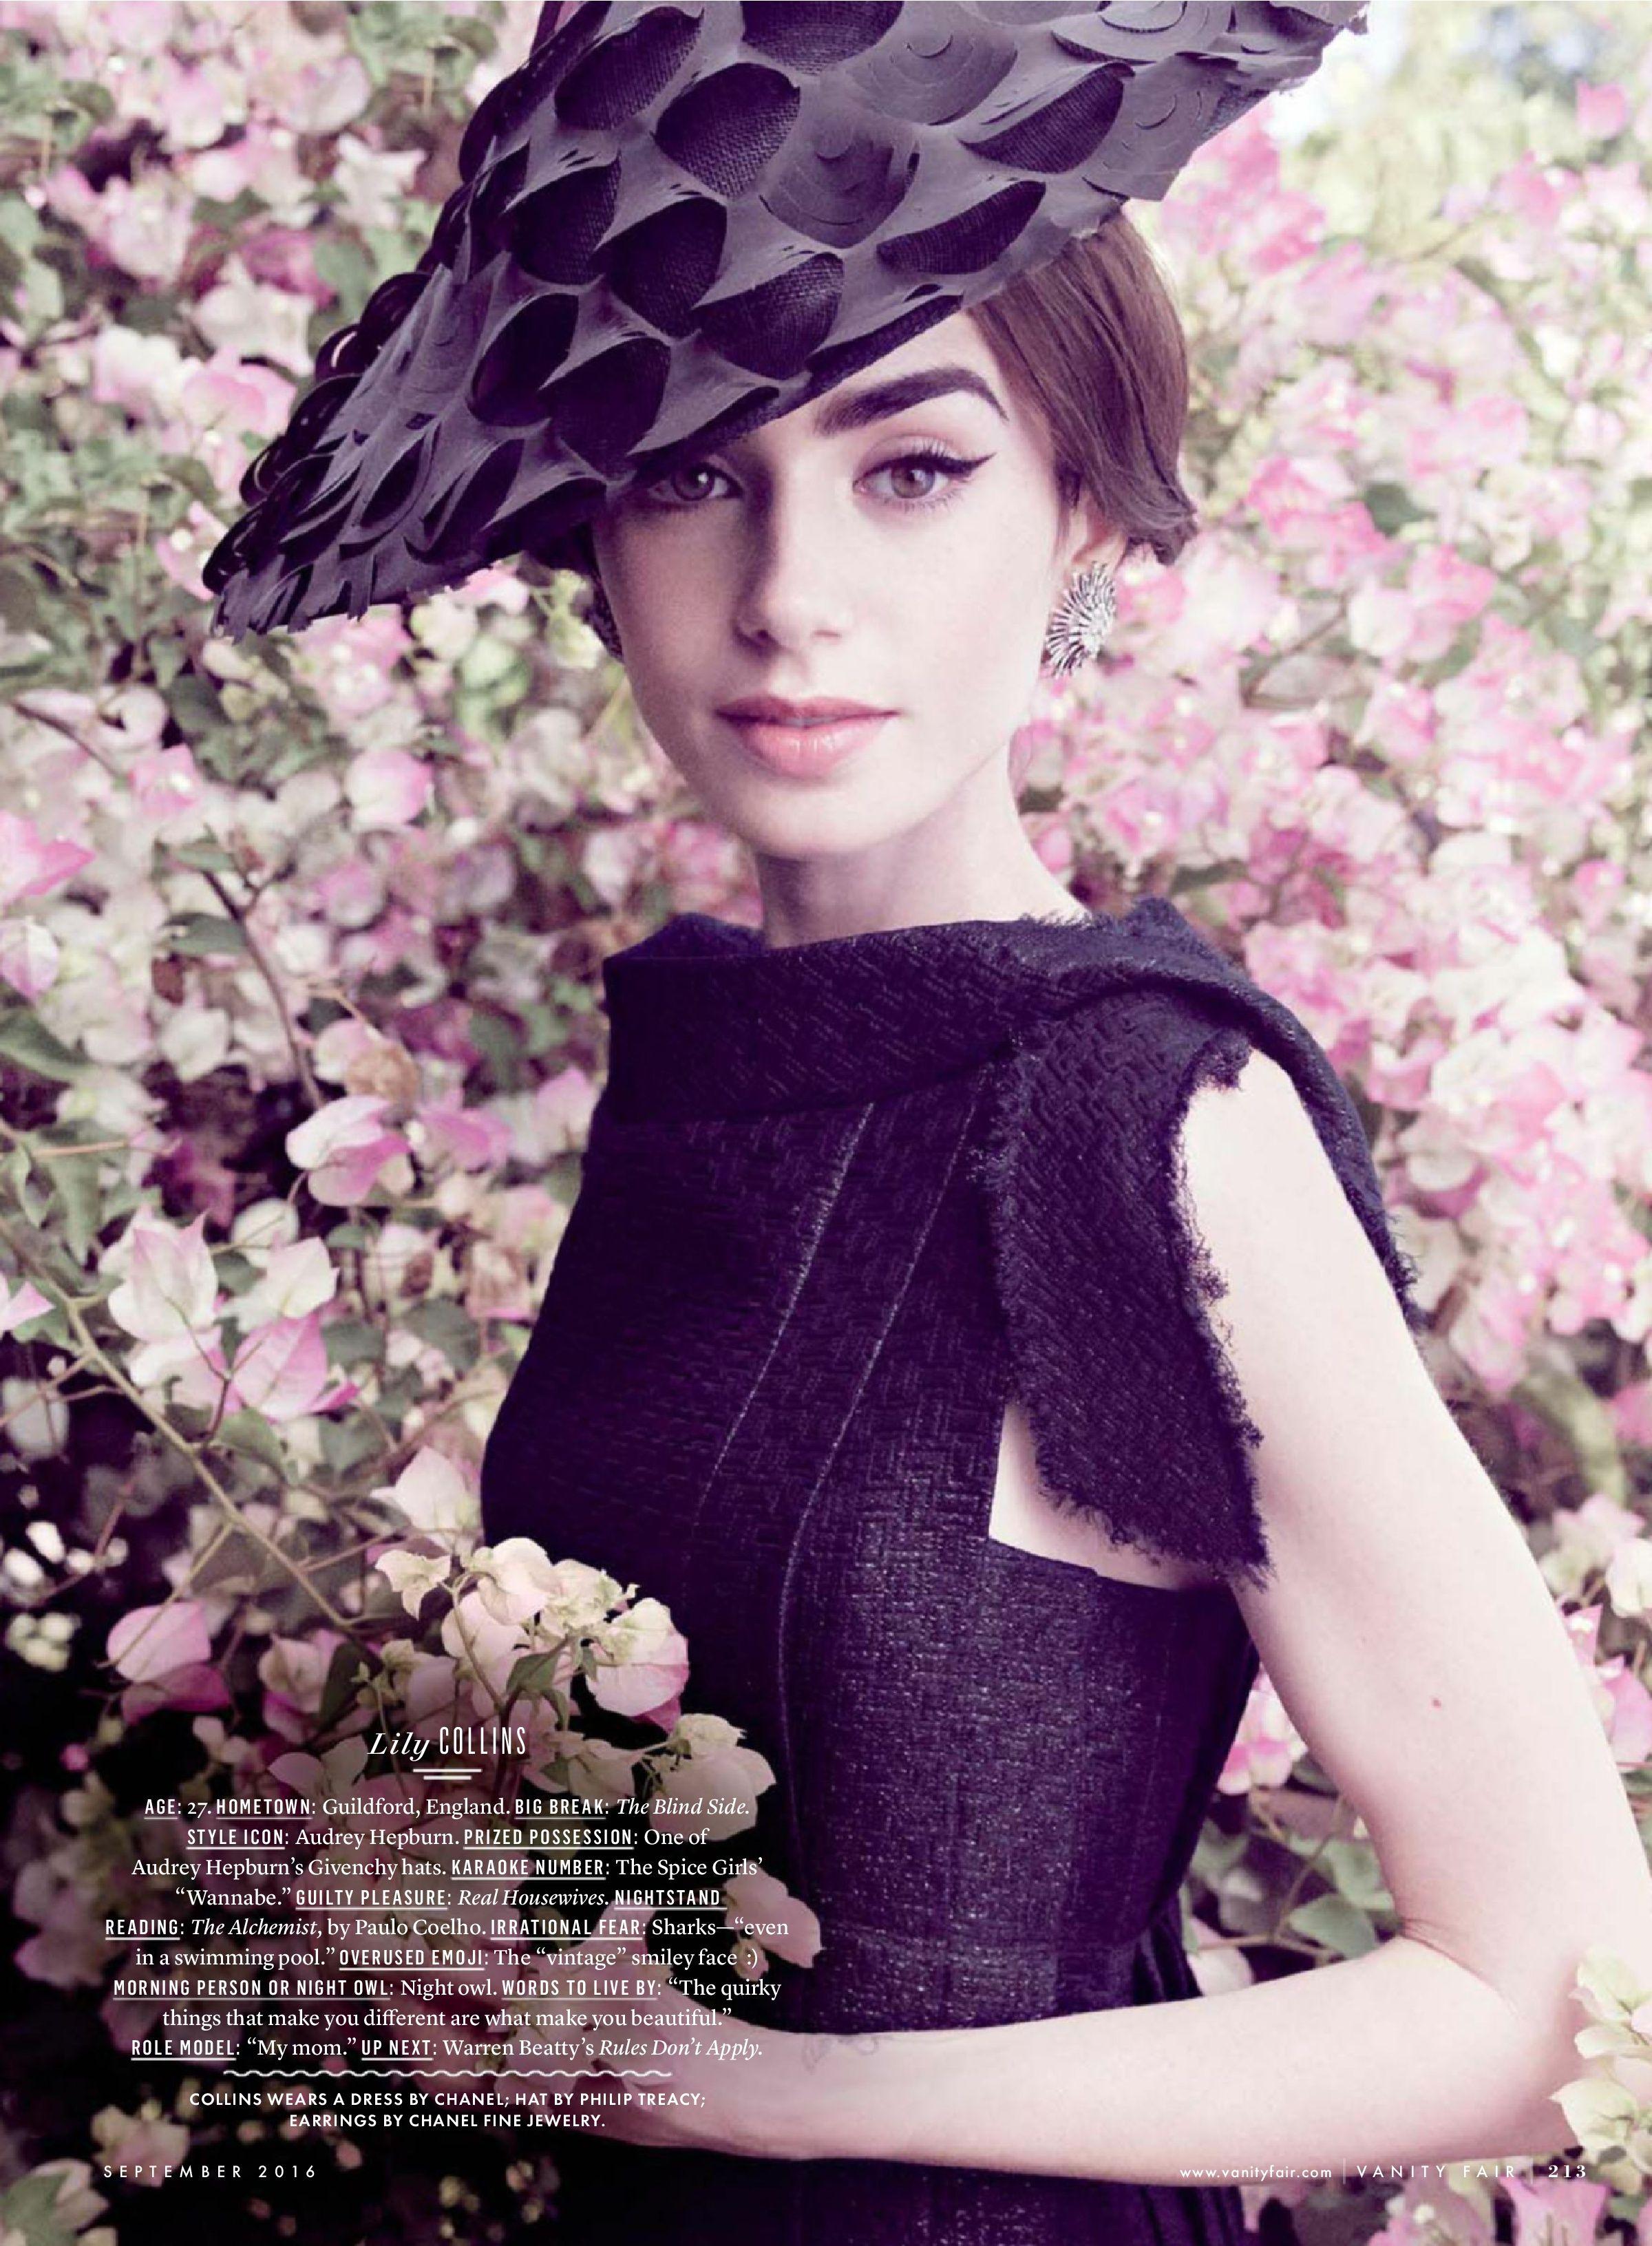 Pin de it girls en lily collins | Pinterest